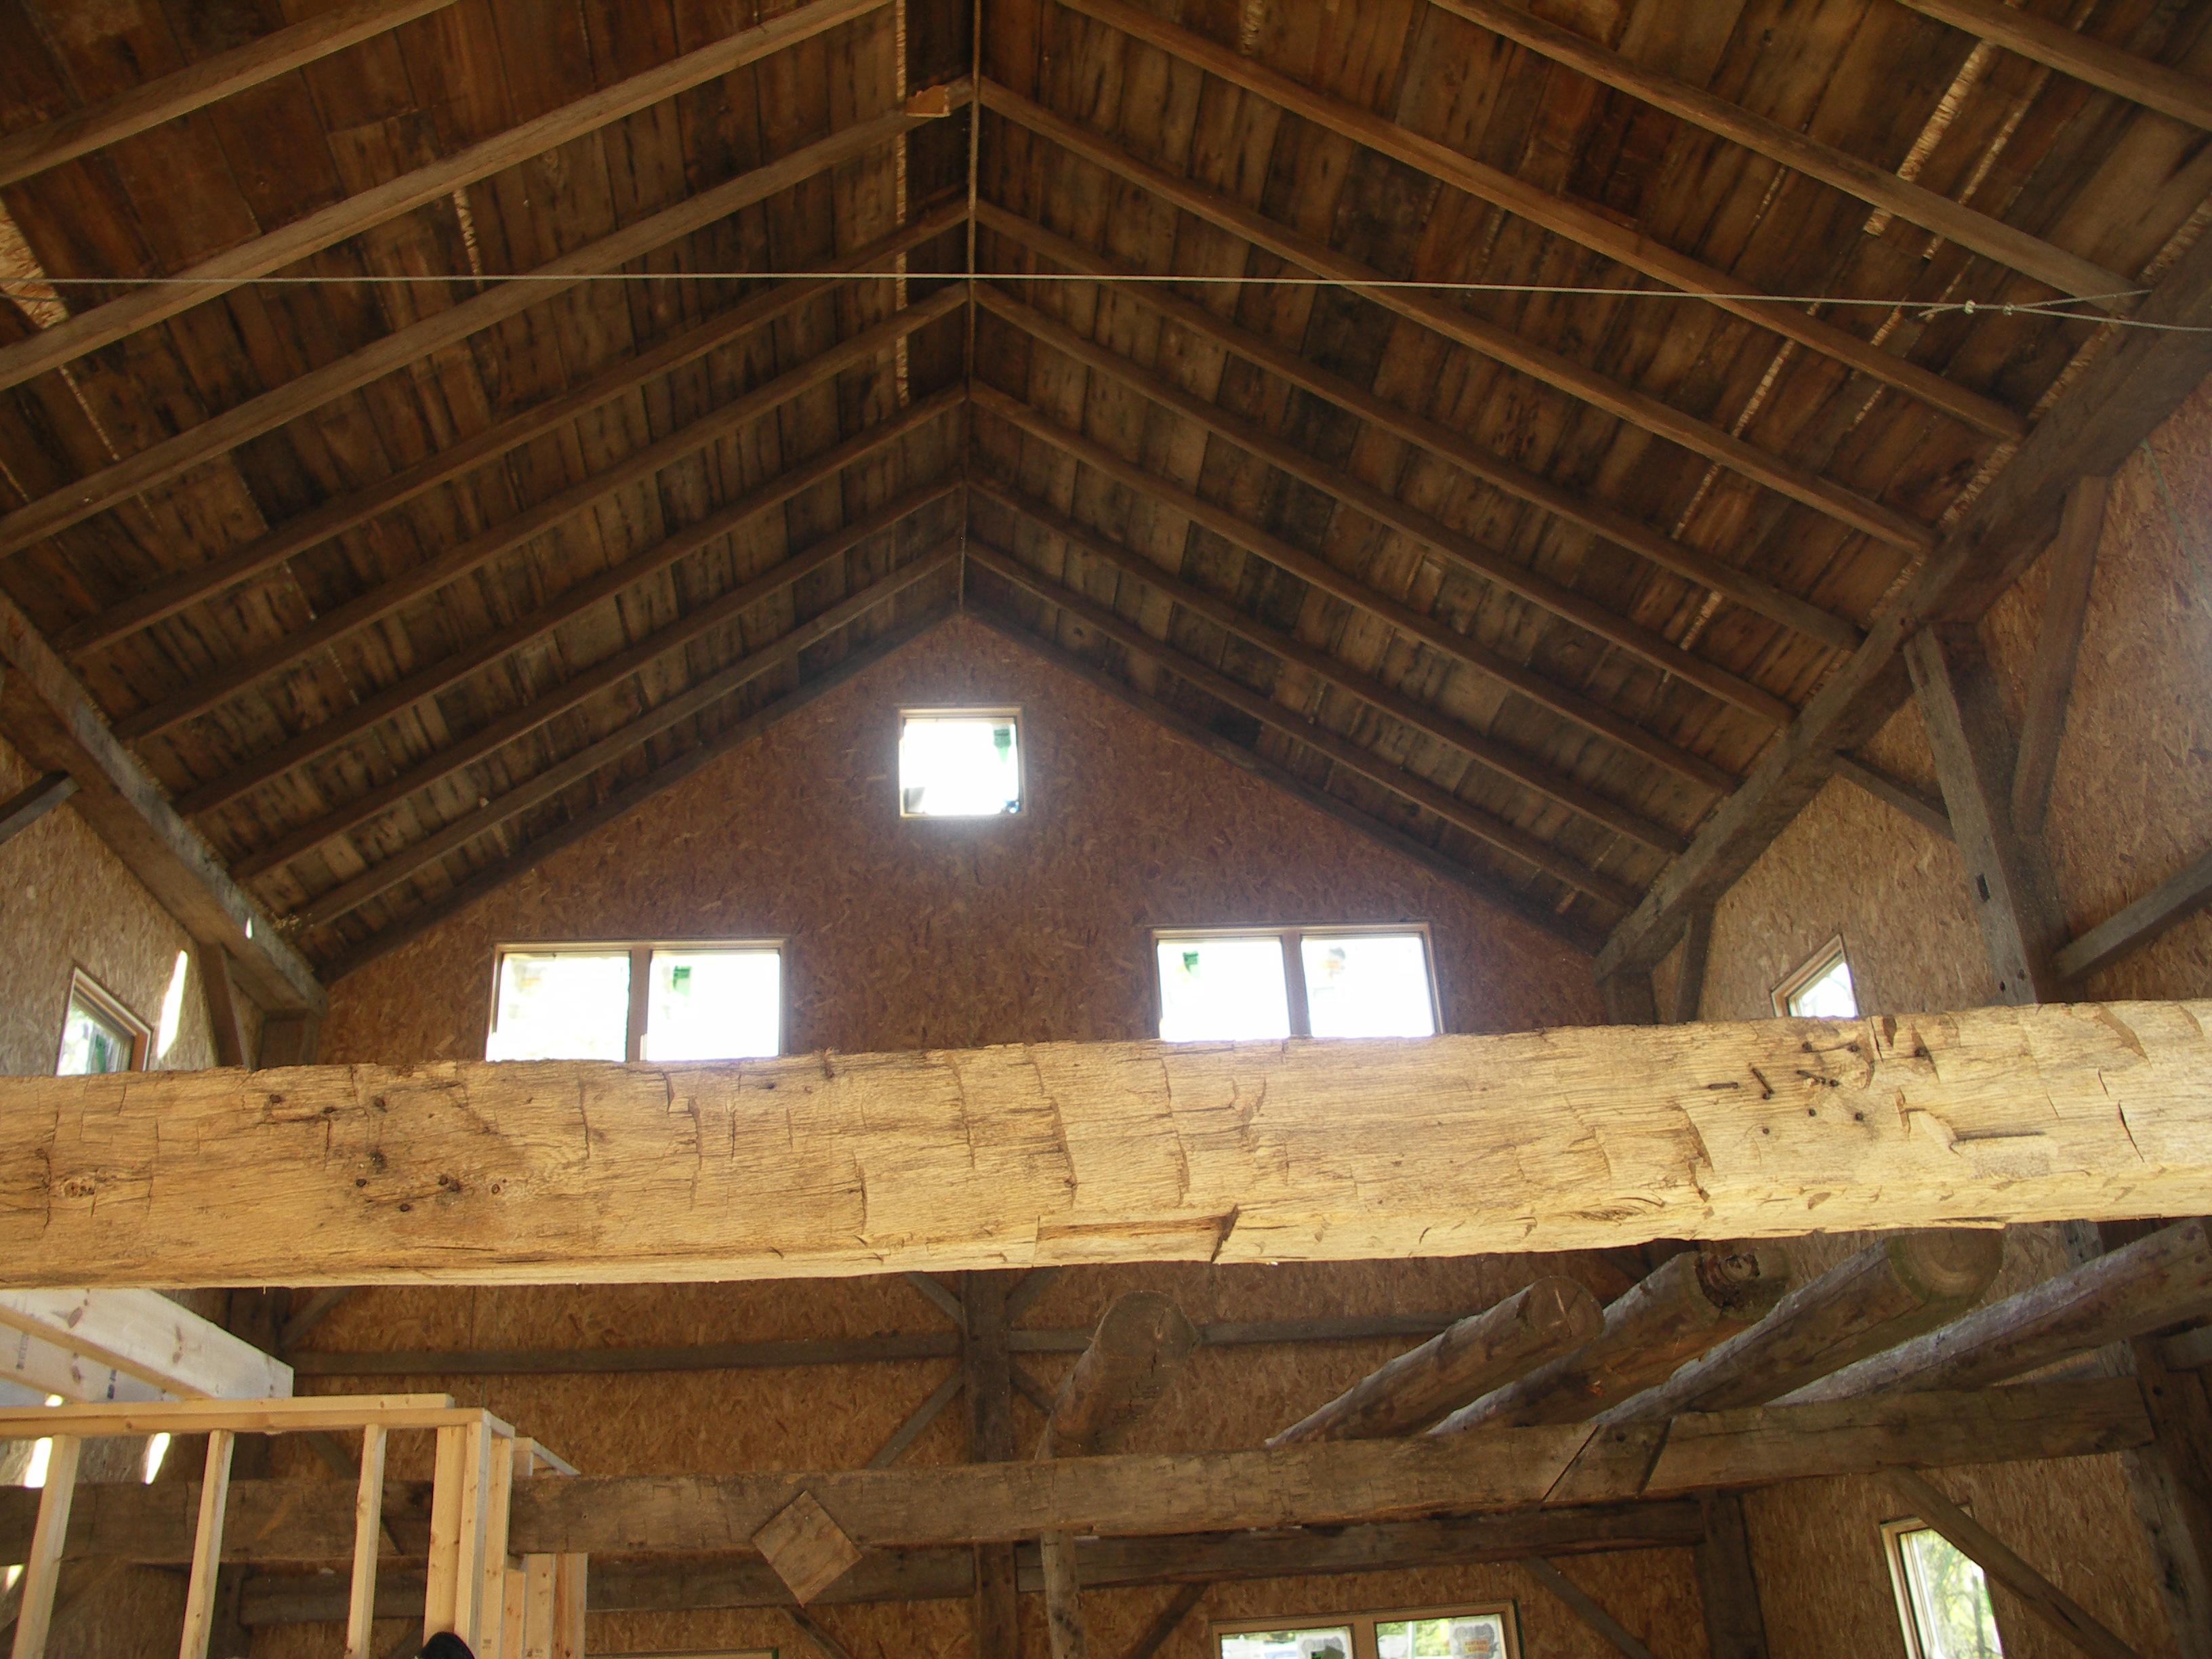 Insulspan 174 Sips Help Turn An 1840s Barn Into An Energy